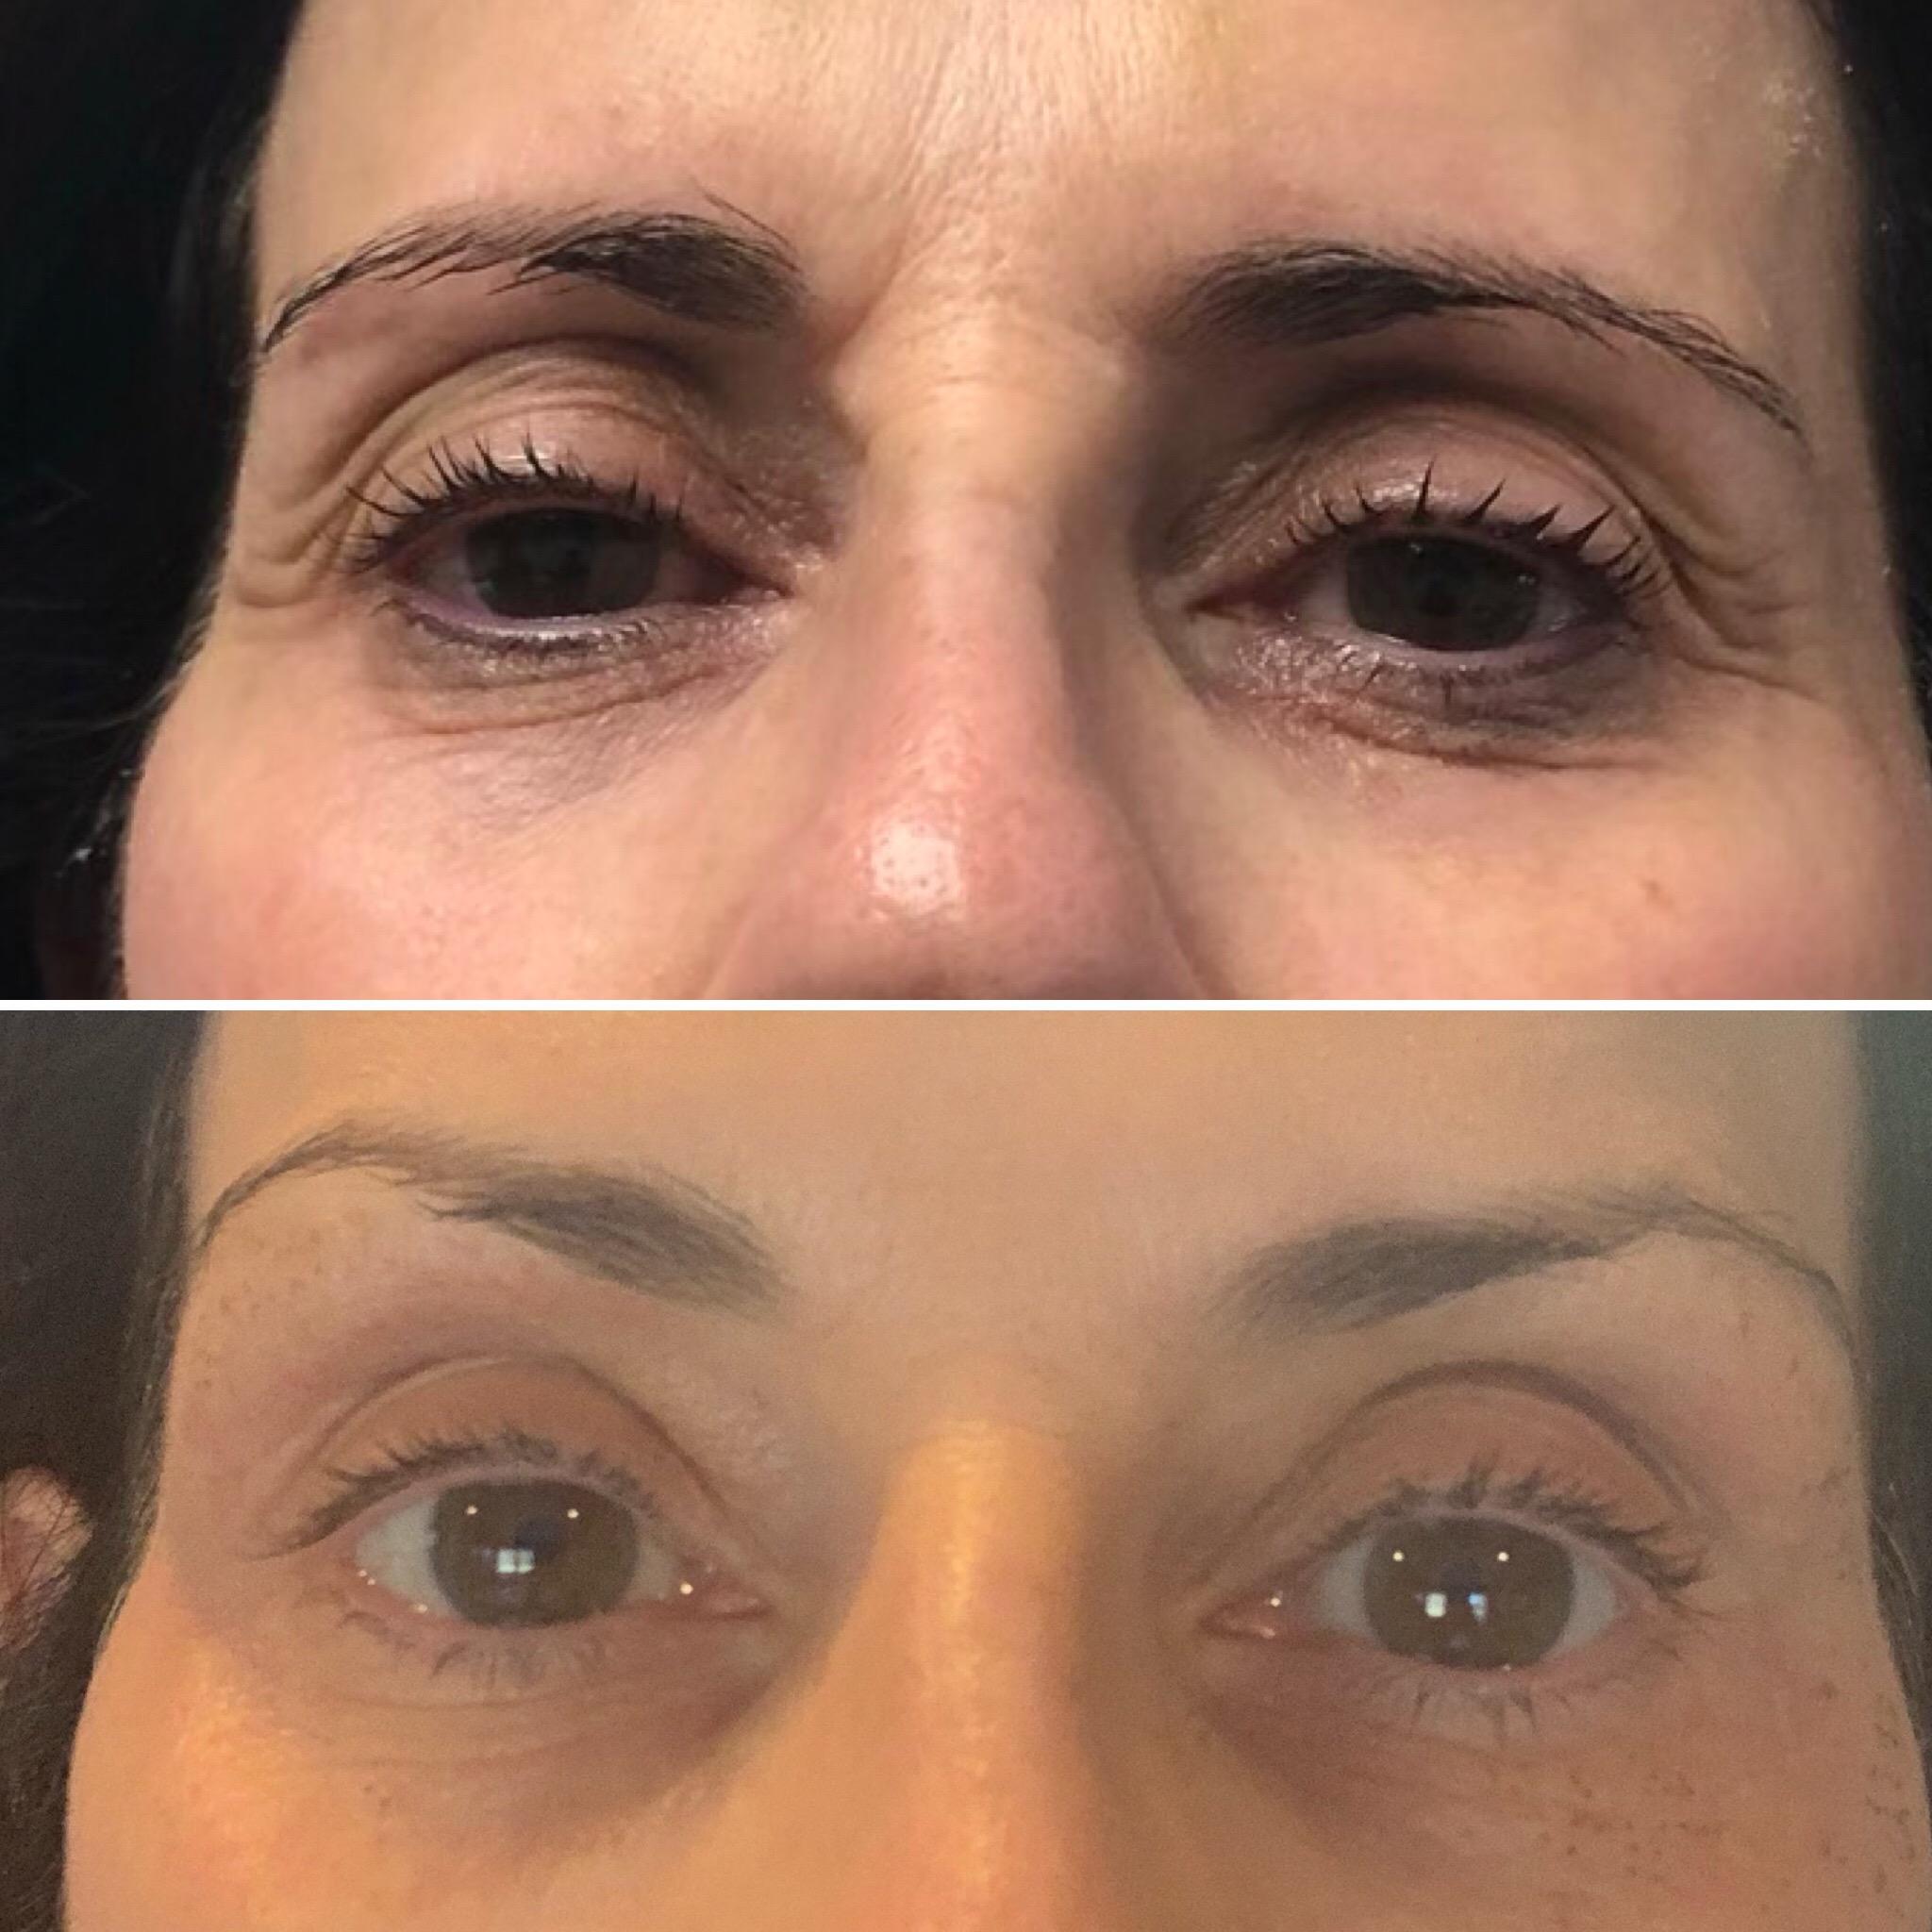 Plasma Pen - Advanced Skin Lifting, Tightening & Rejuvenating Device